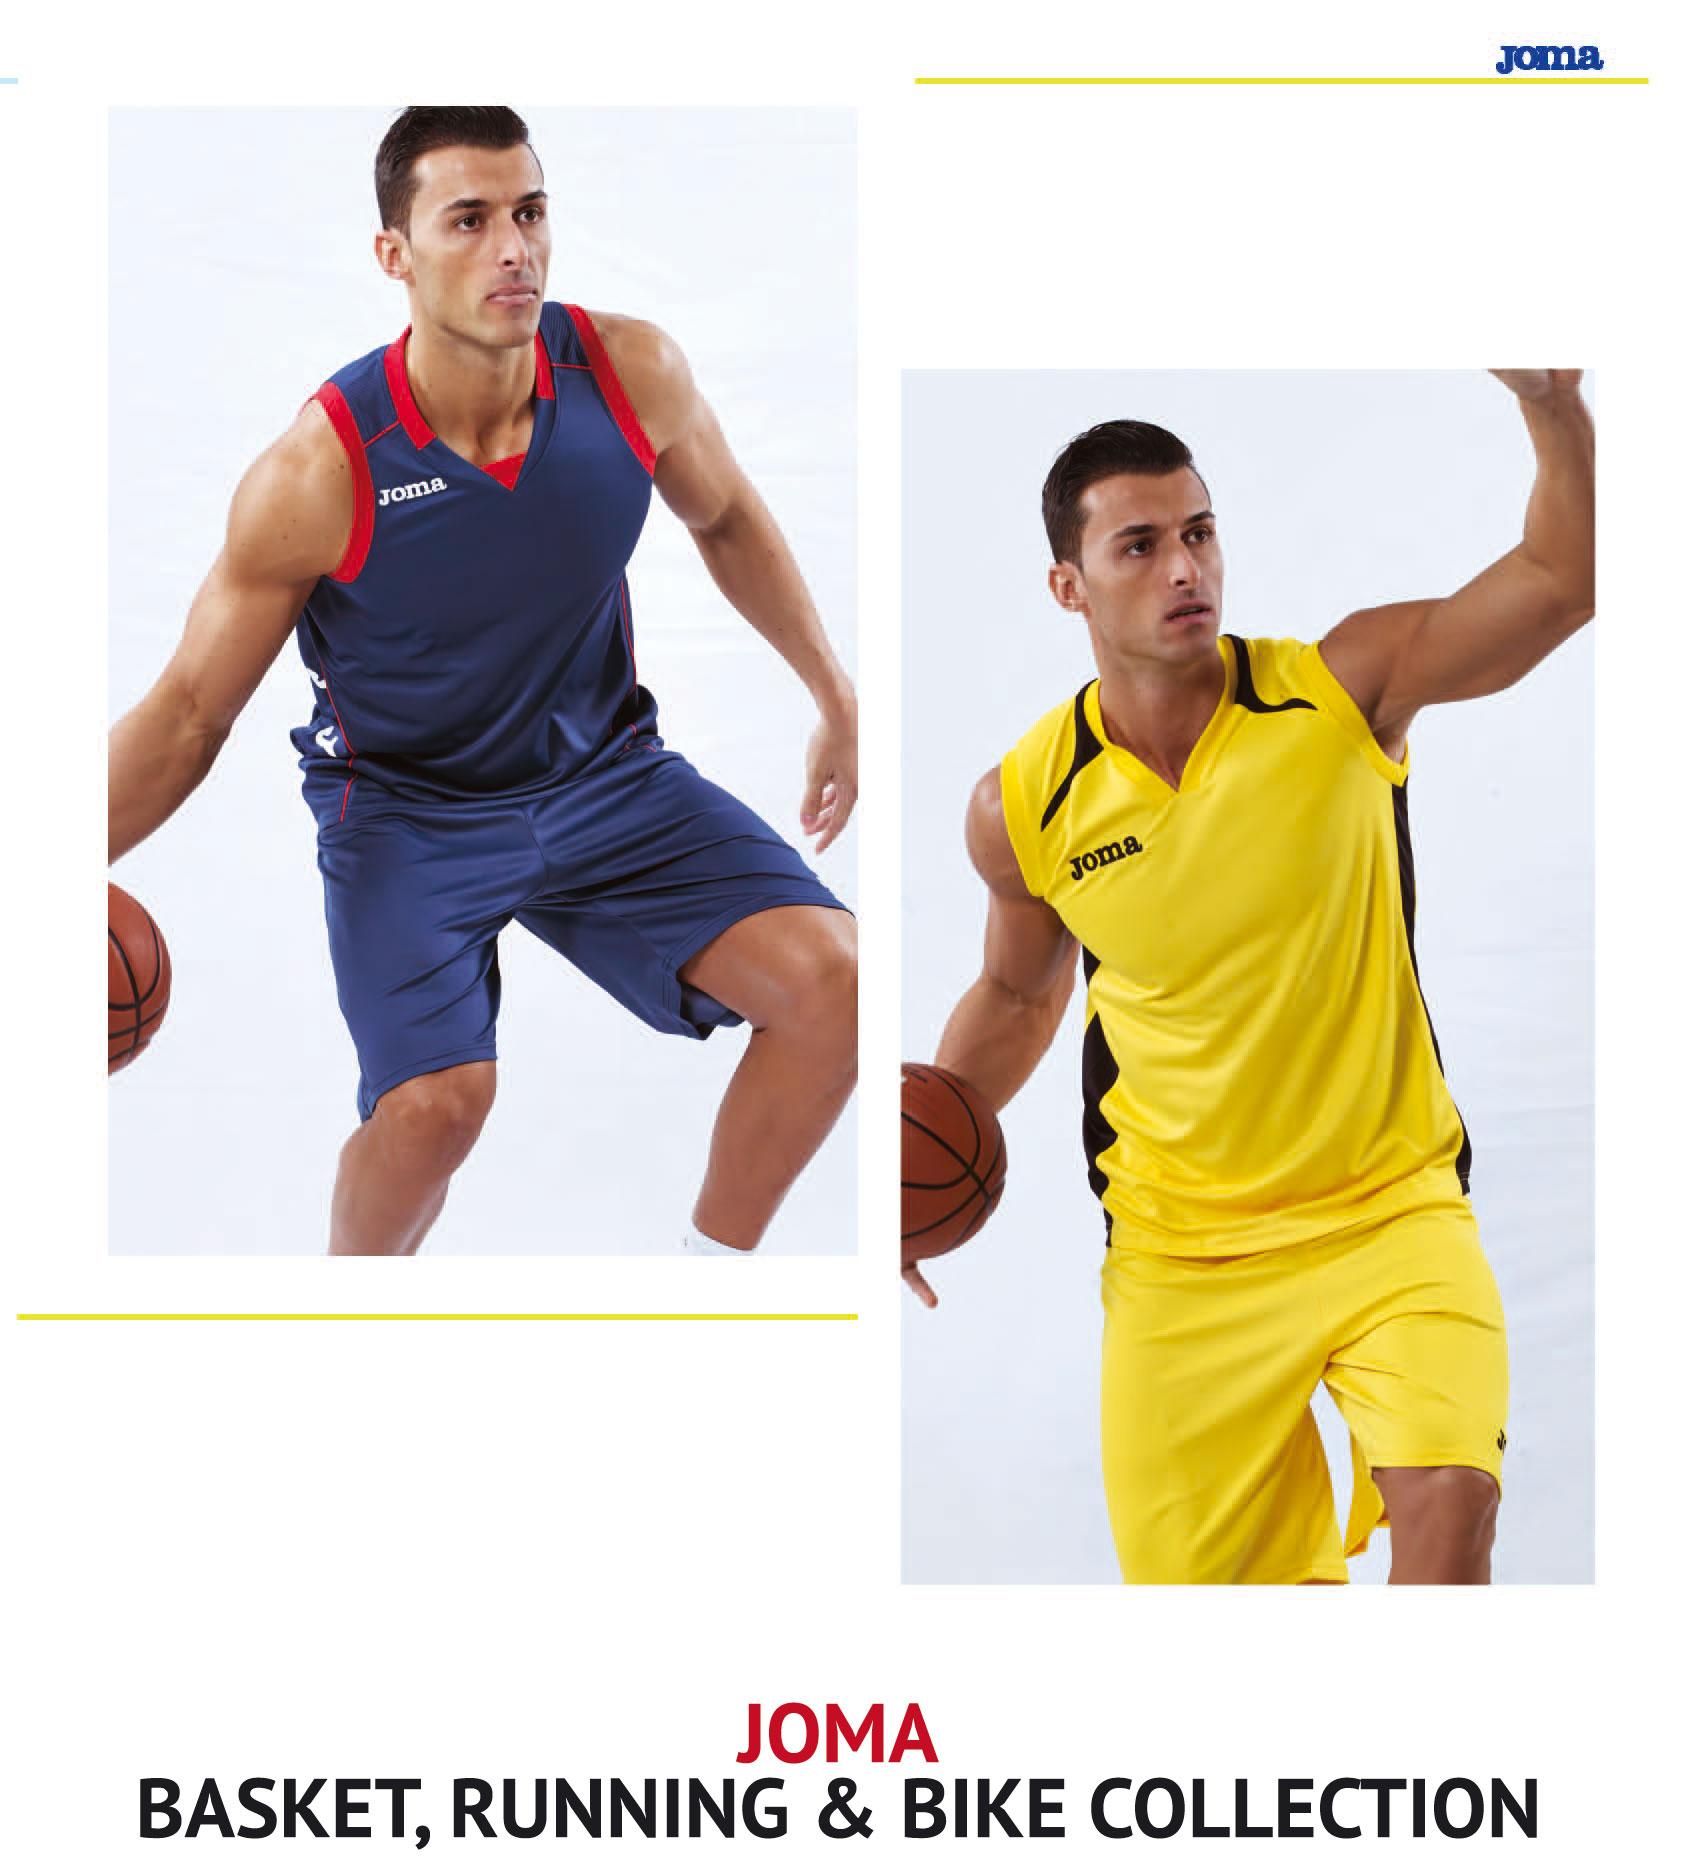 Joma-Basket,-Running